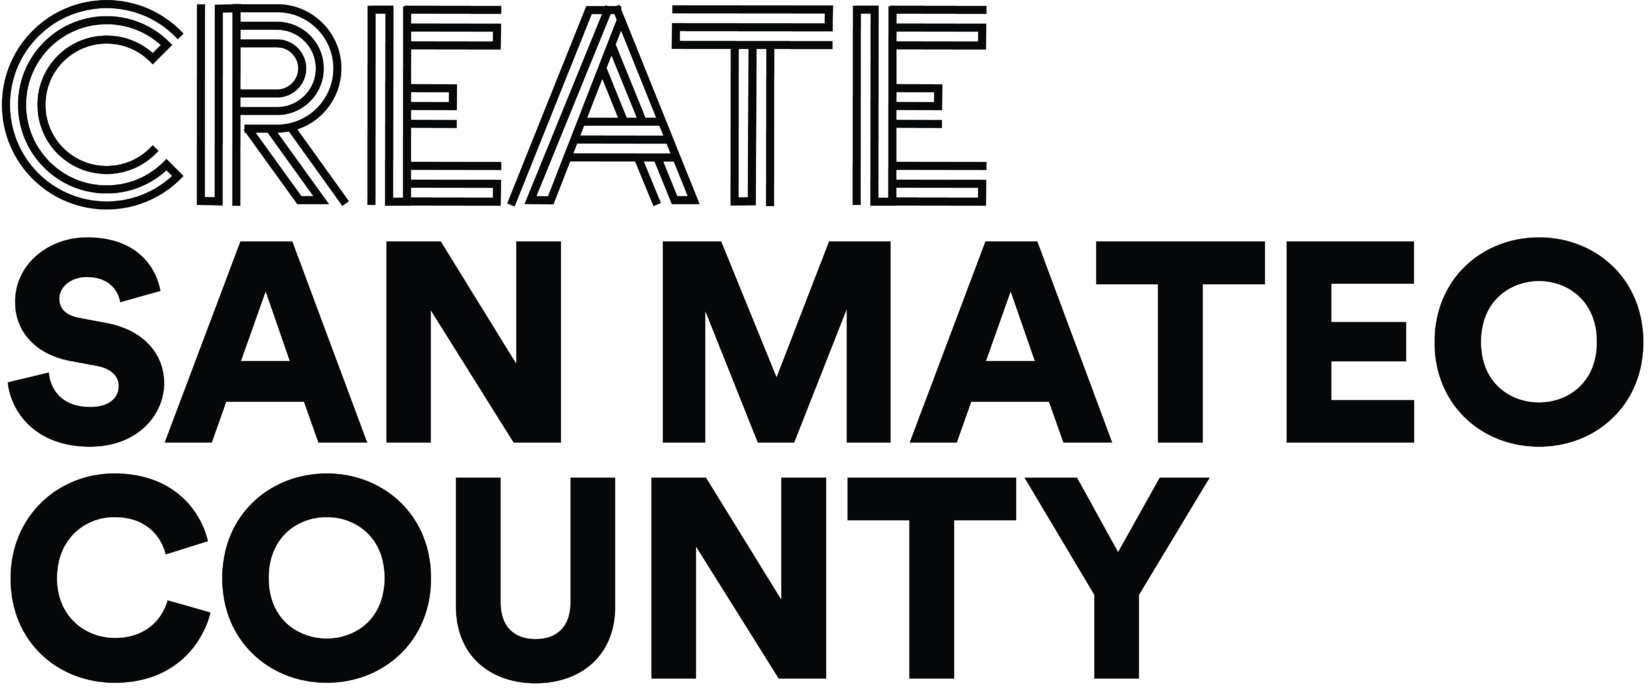 https://secureservercdn.net/198.71.233.51/mgq.552.myftpupload.com/wp-content/uploads/2020/01/Create-Ca-County-Logos-38-e1580495218819.png?time=1591126550